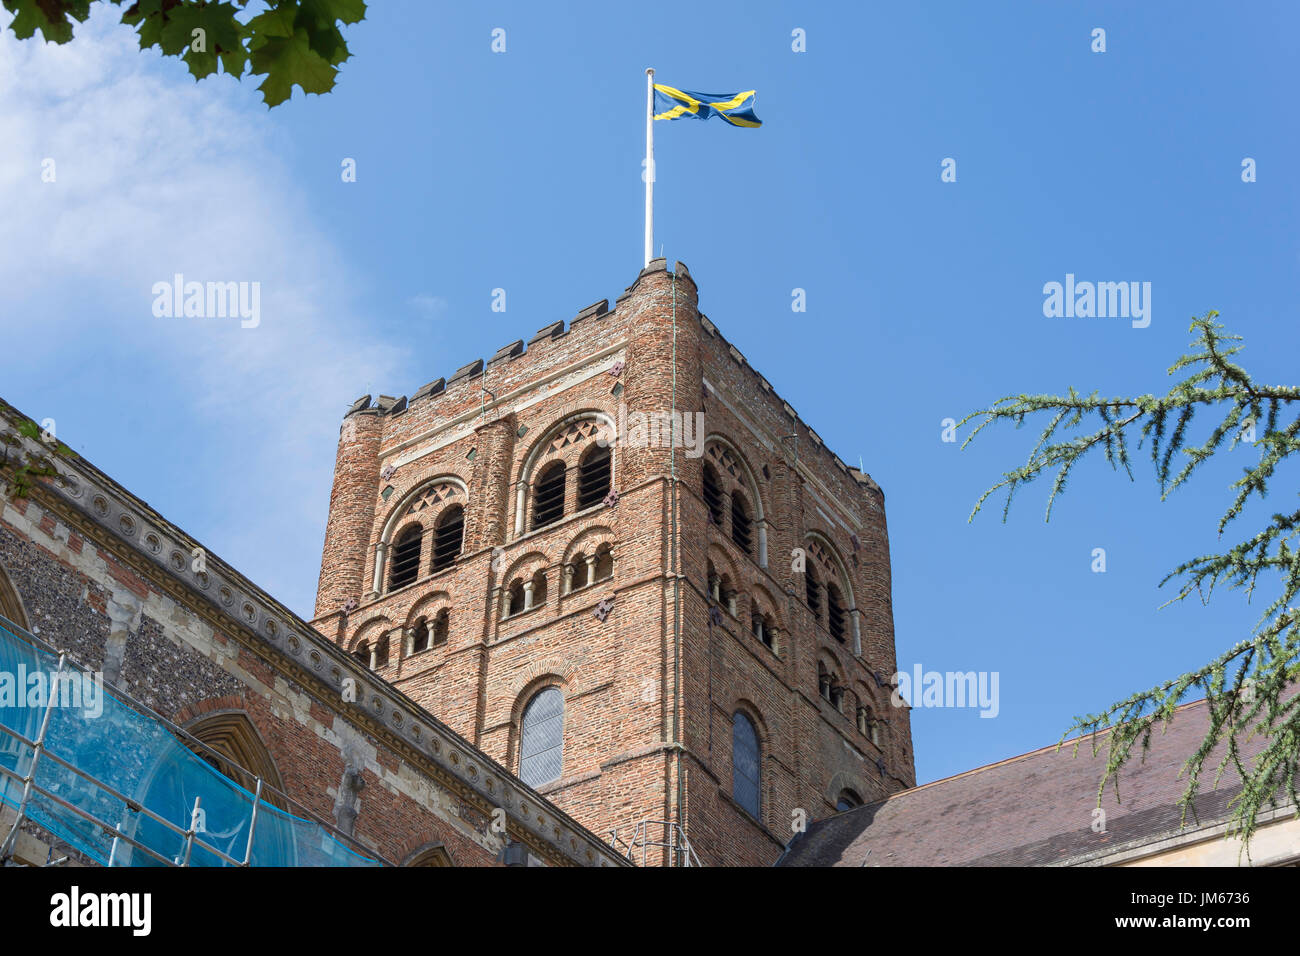 Abbey Church tower, St.Albans, Hertfordshire, England, United Kingdom - Stock Image